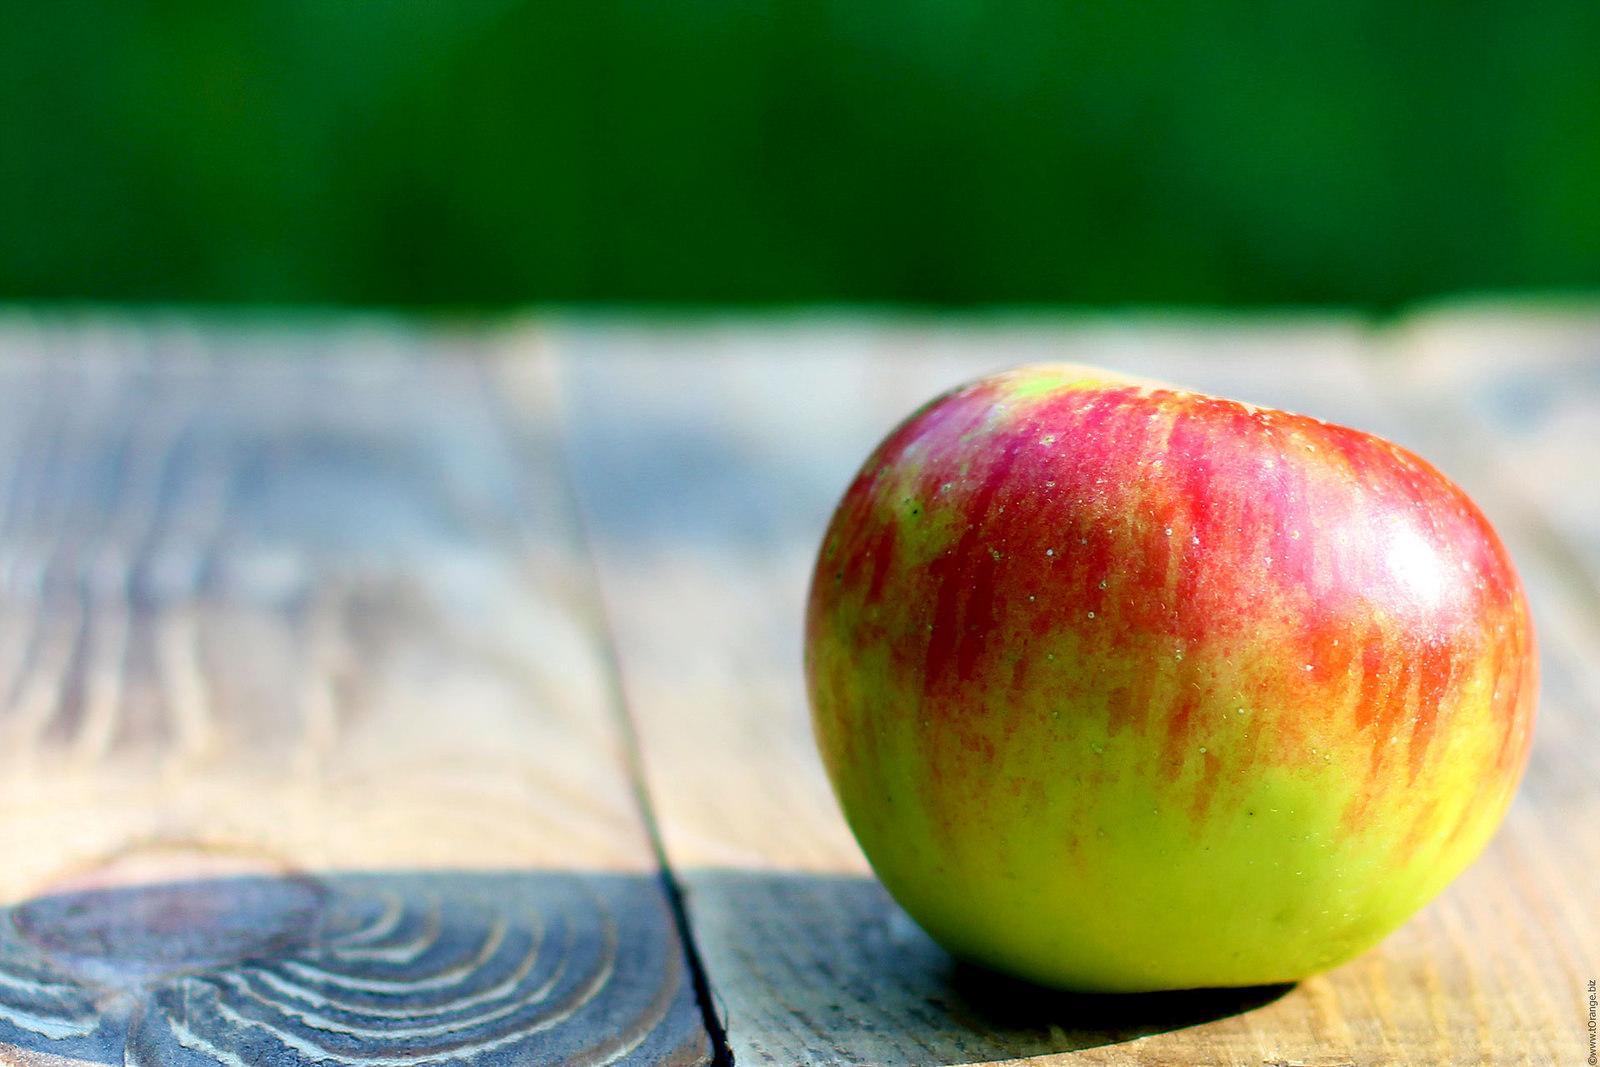 Jabłko na stole